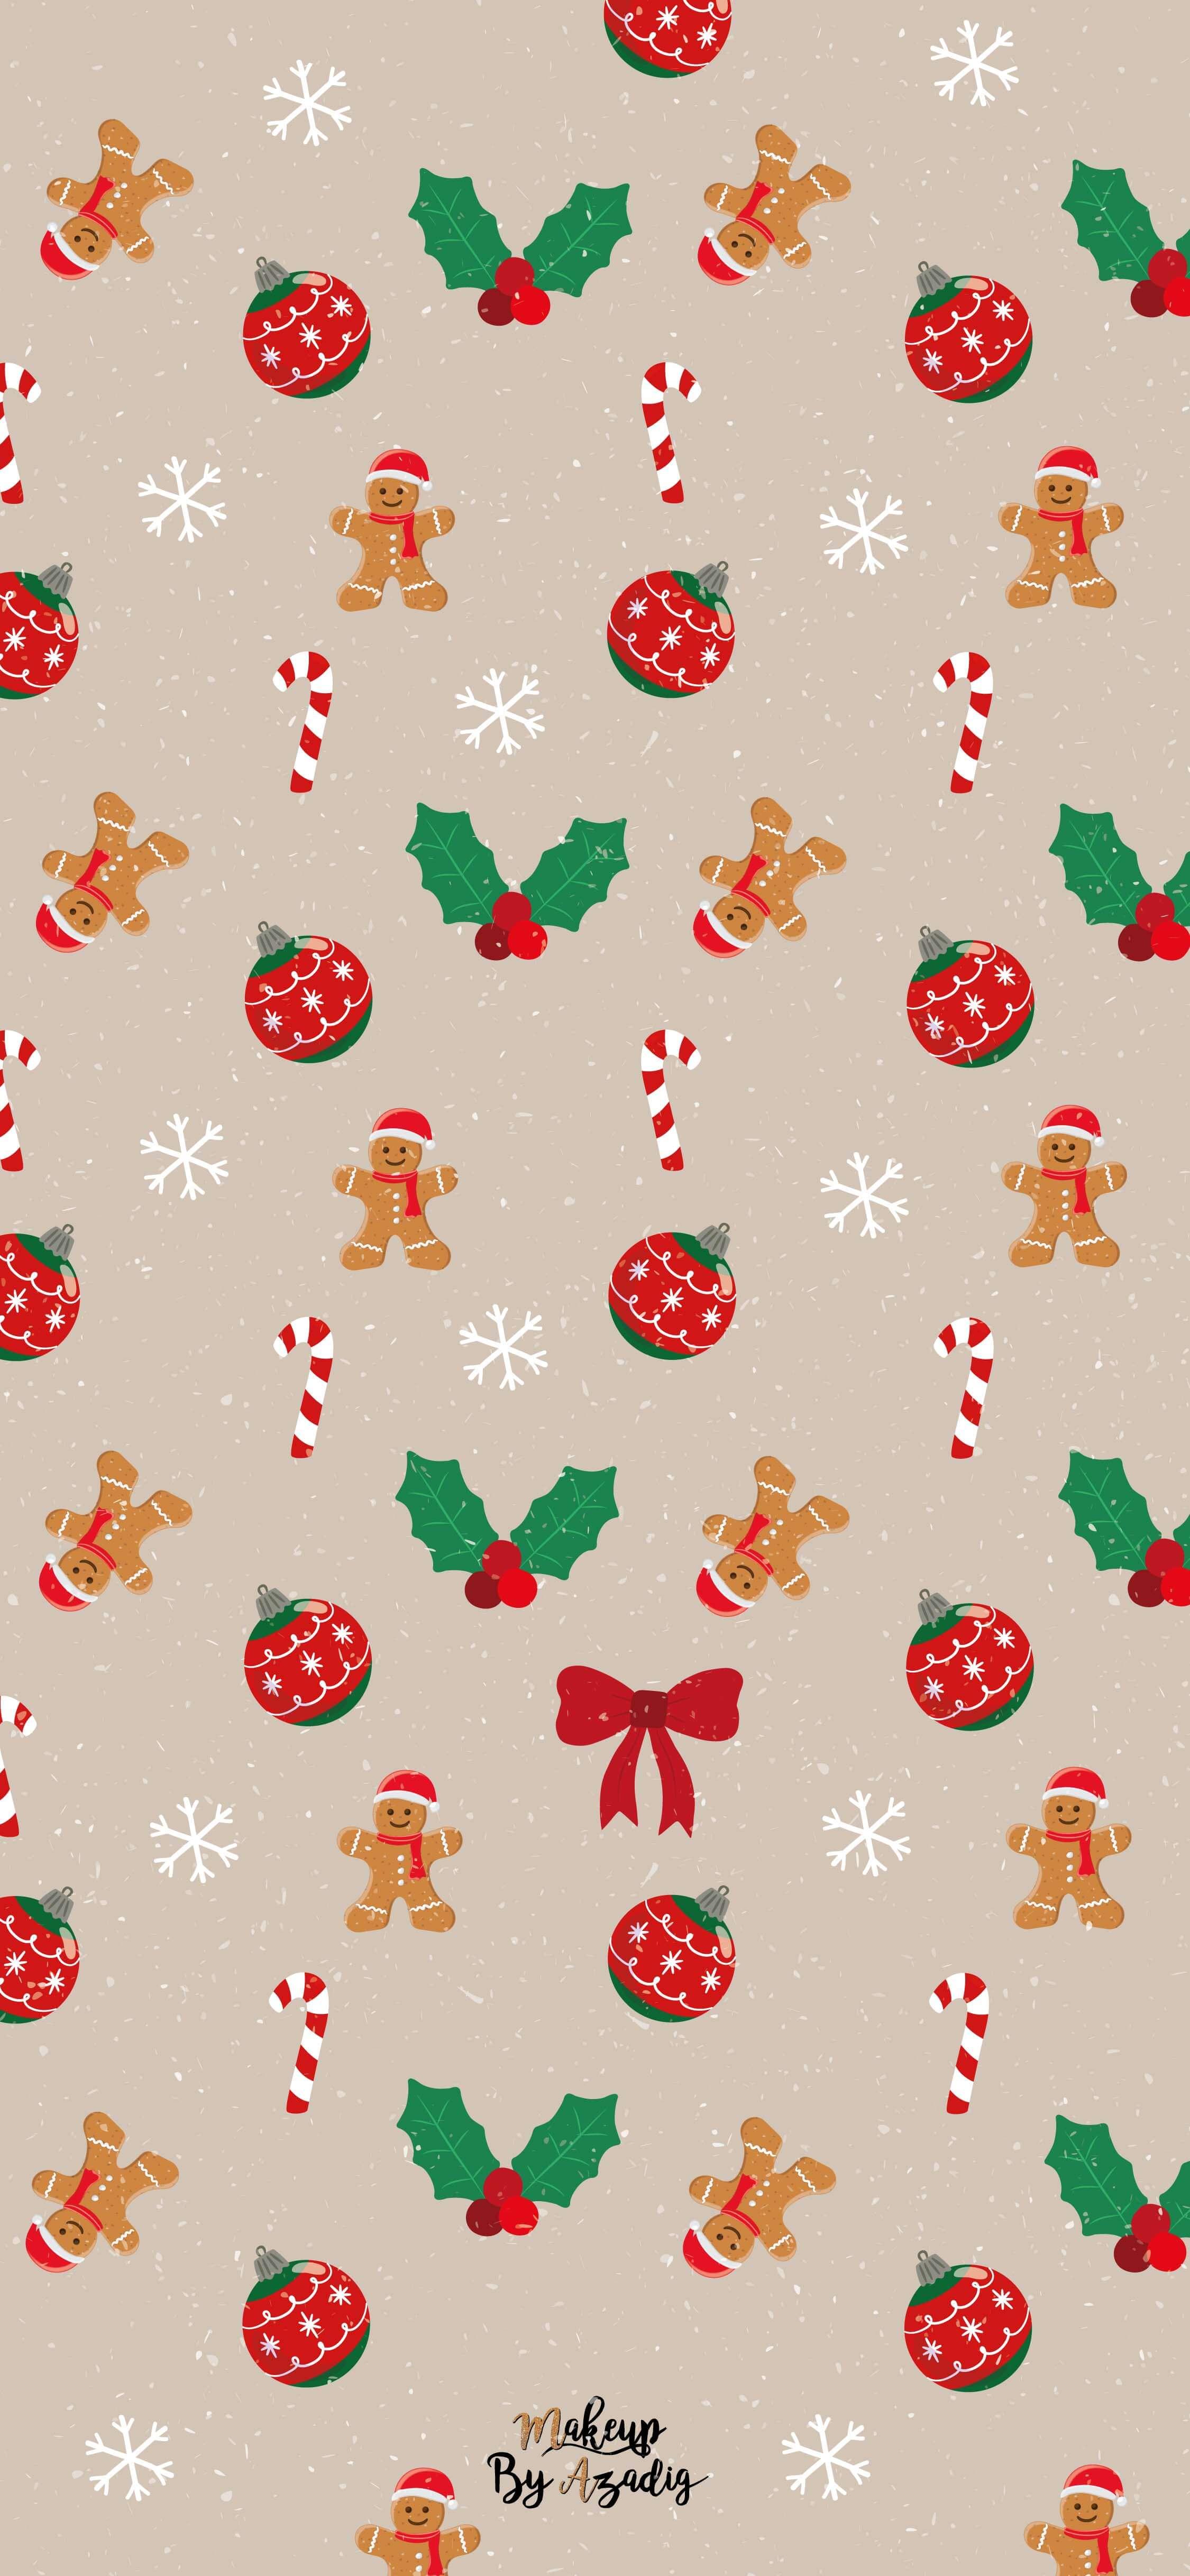 fond-decran-wallpaper-christmas-noel-elements-gingerbread-houx-decoration-december-iphone-samsung-huawai-makeupbyazadig-tendance